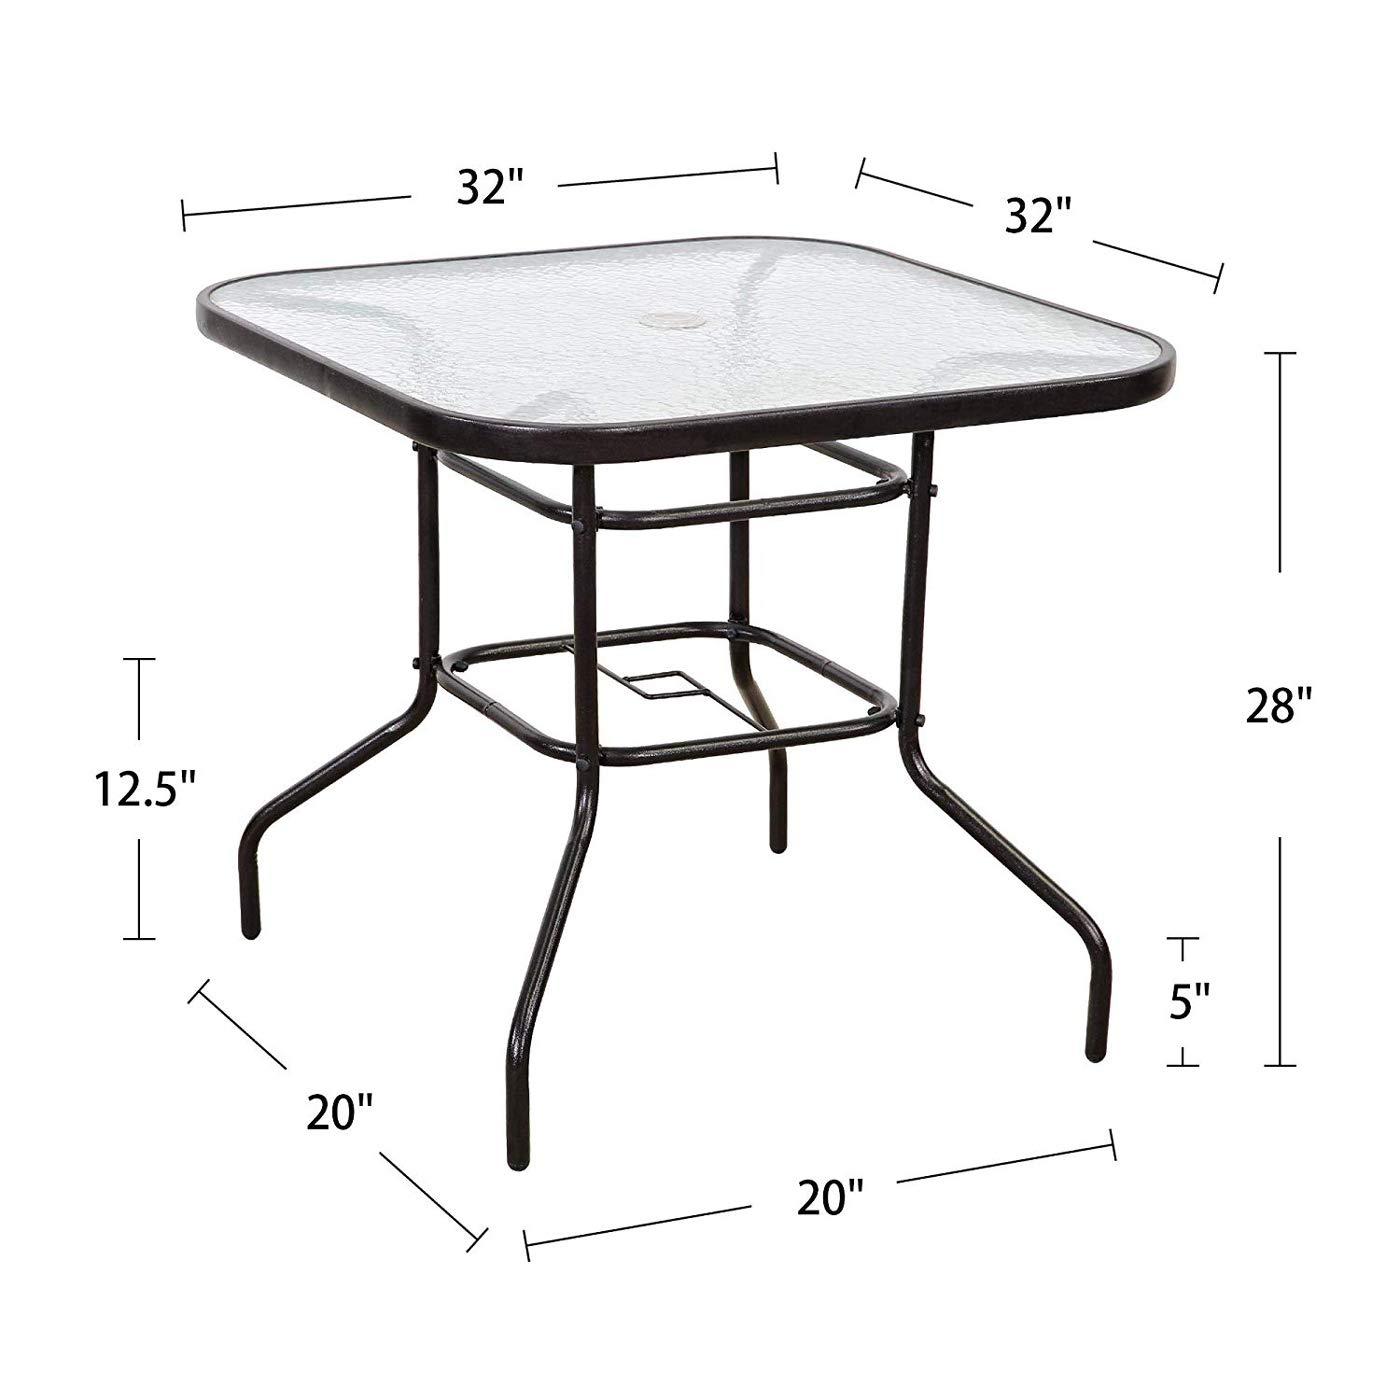 Amazon com wbbzd outdoor dining table terrace tempered glass table 32 terrace dining table with umbrella hole perfect garden deck lawn squaretable